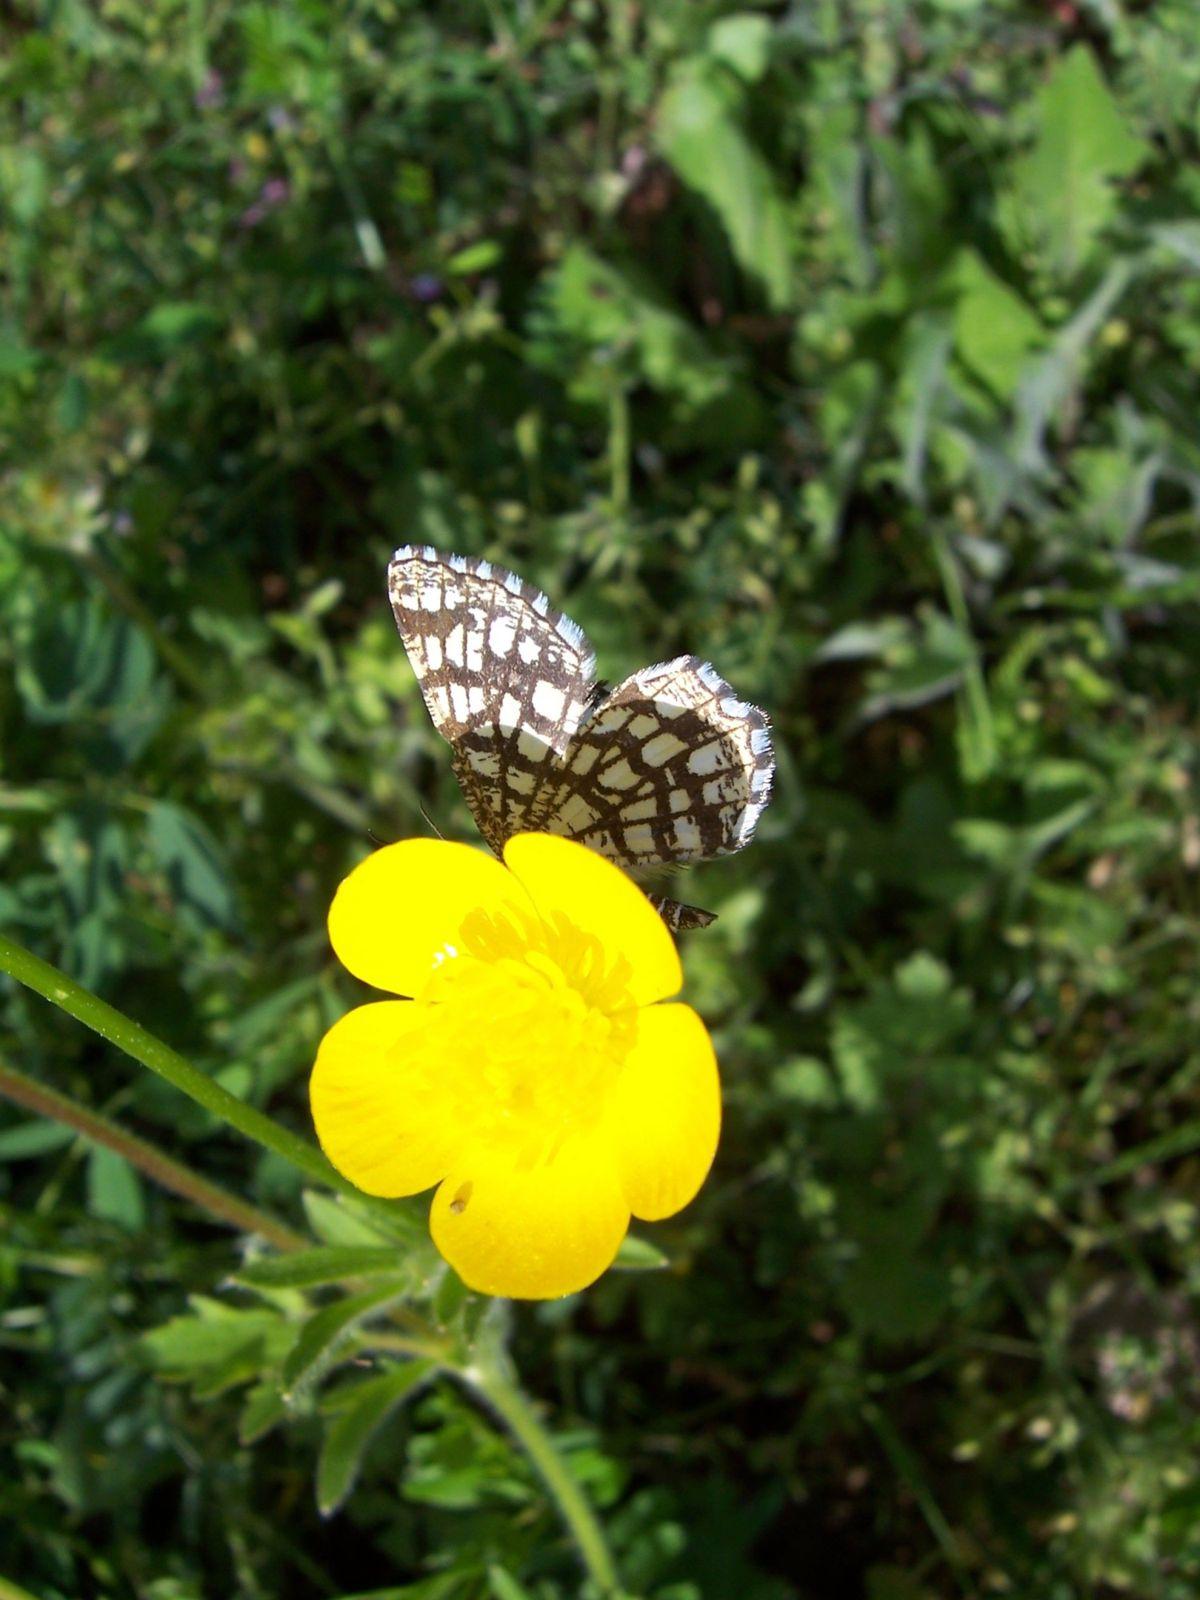 Photo papillon - chiasma clathrata geometridae sur fleur de reno